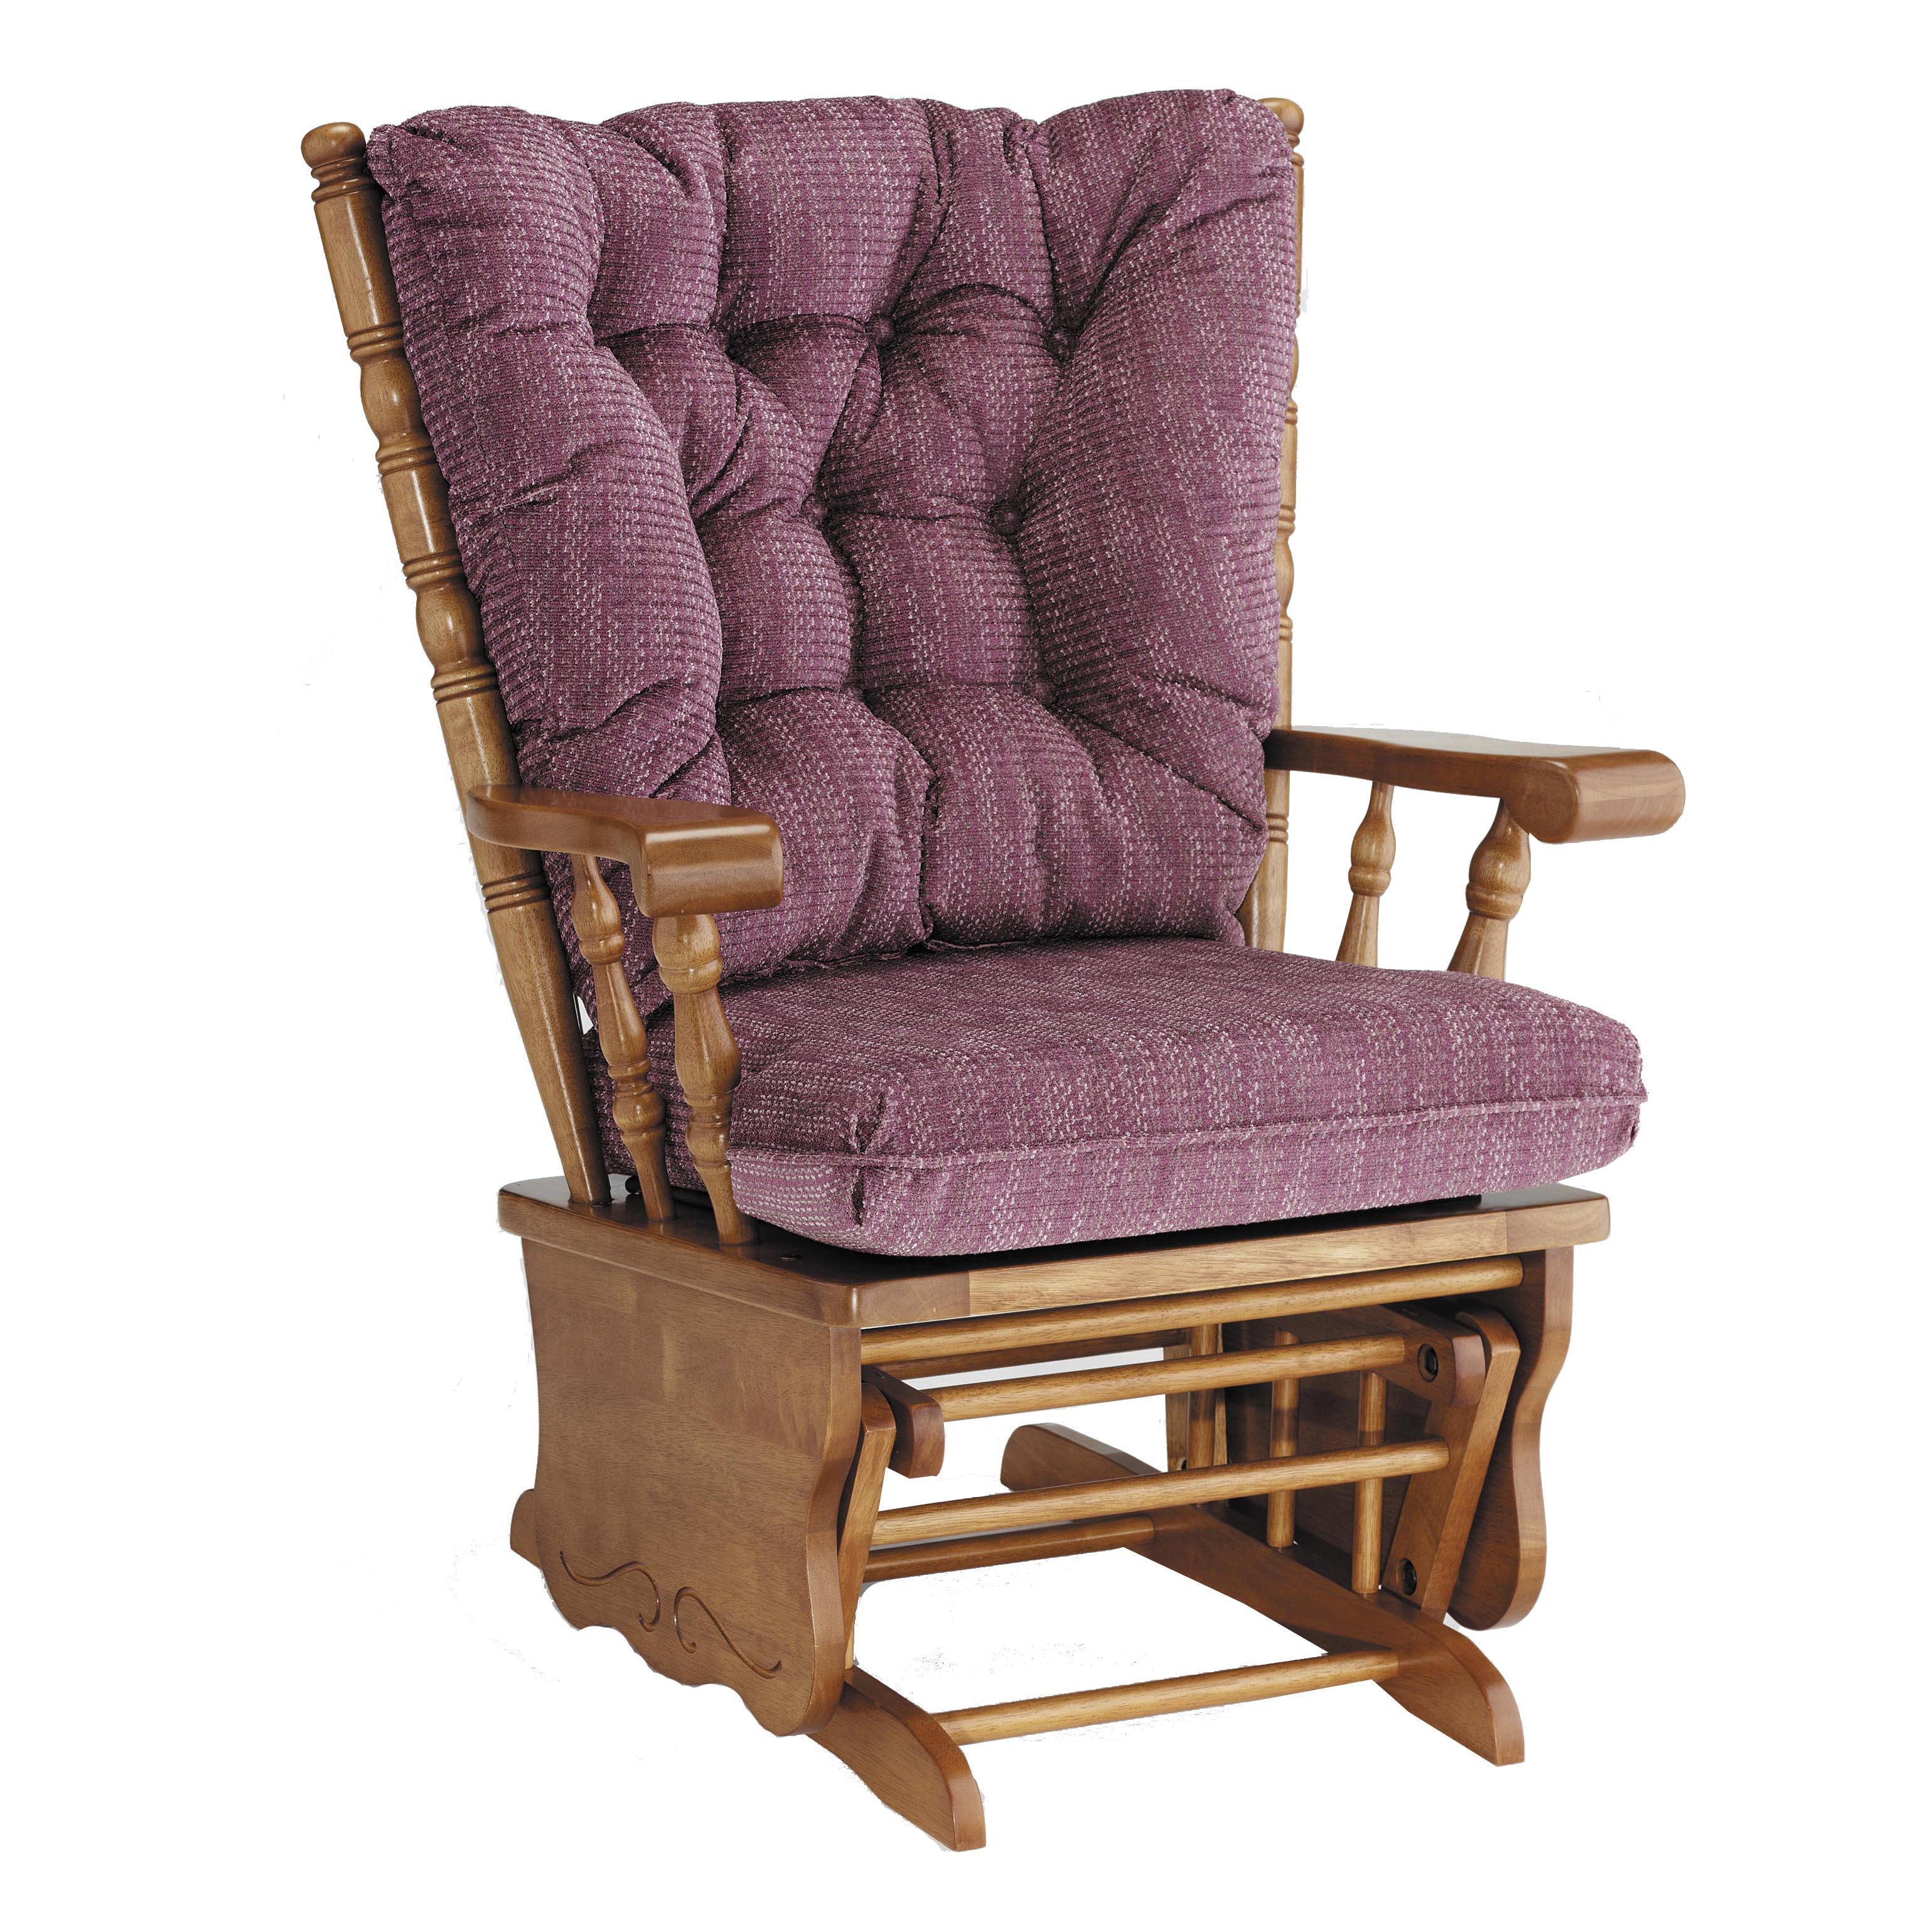 Best home furnishings glider rockers jive glider rocker for Home decor furnishing